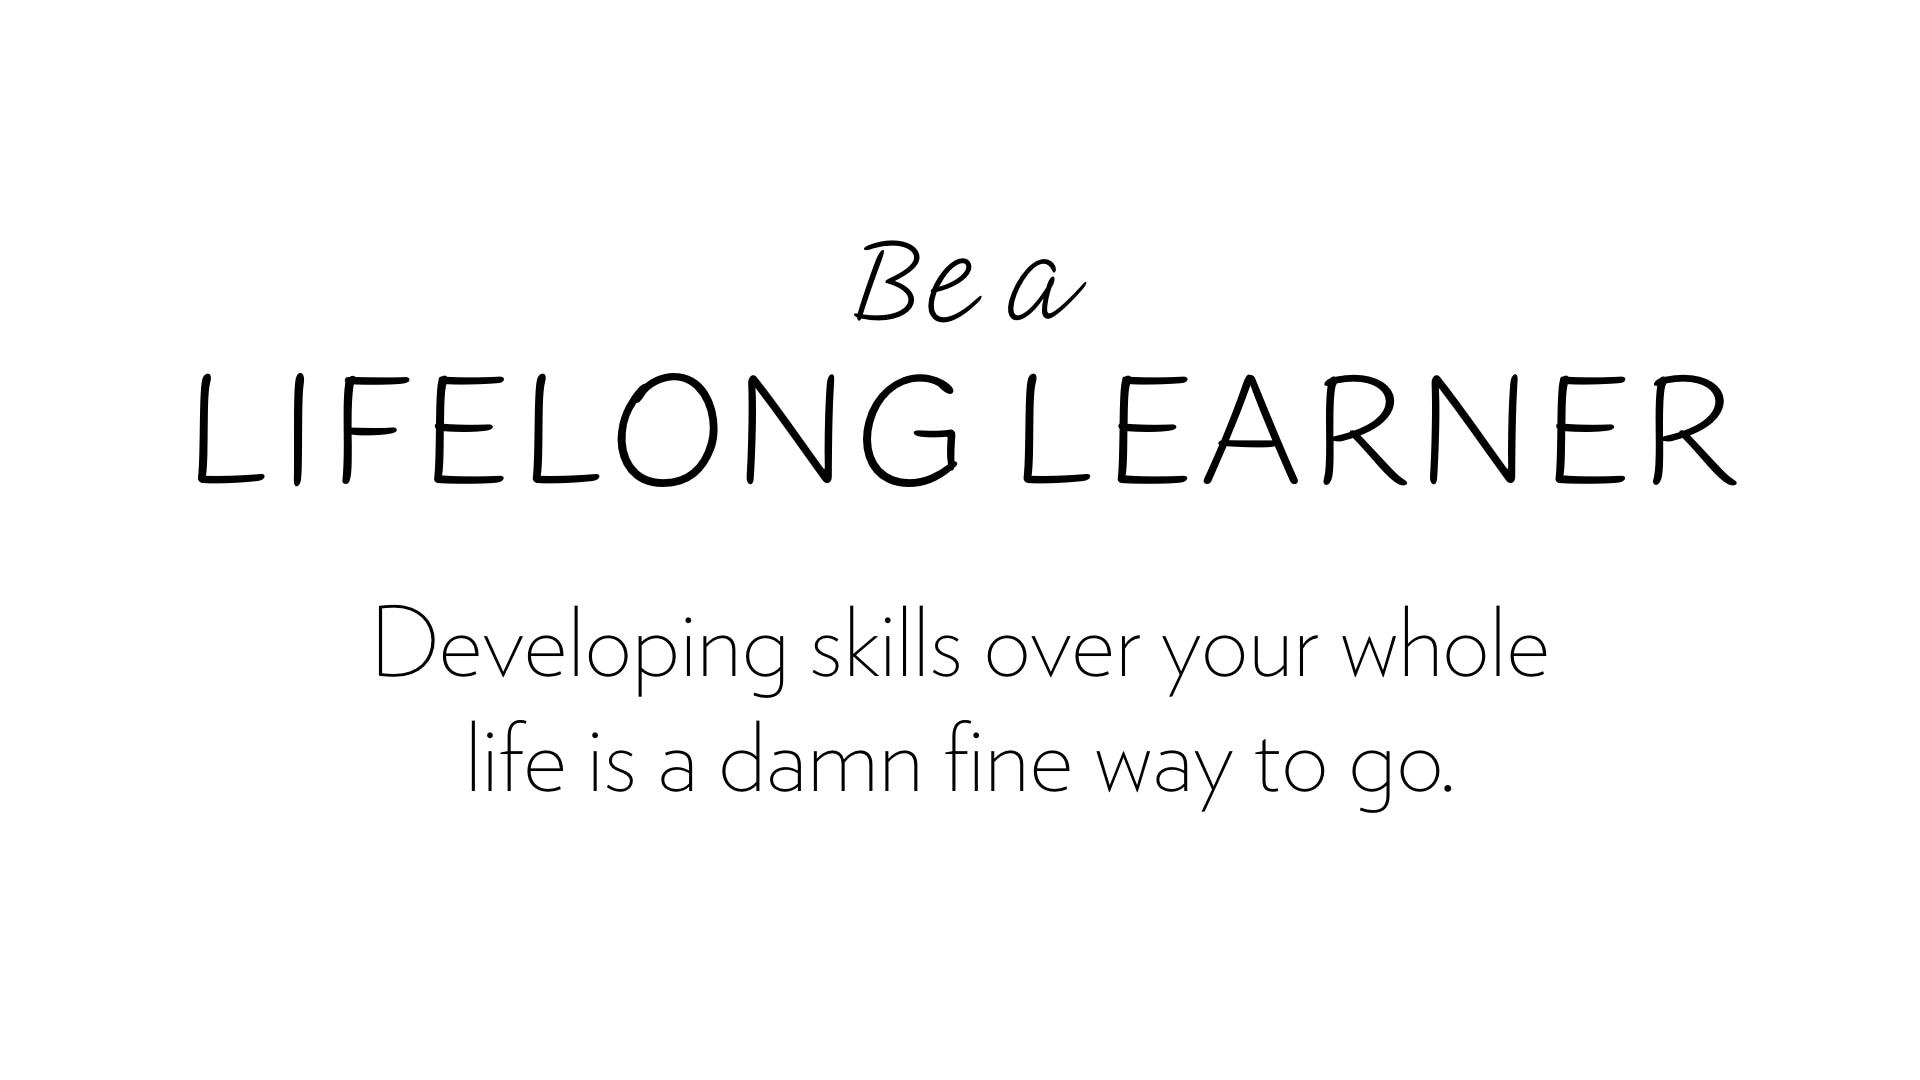 Be a lifelong learner